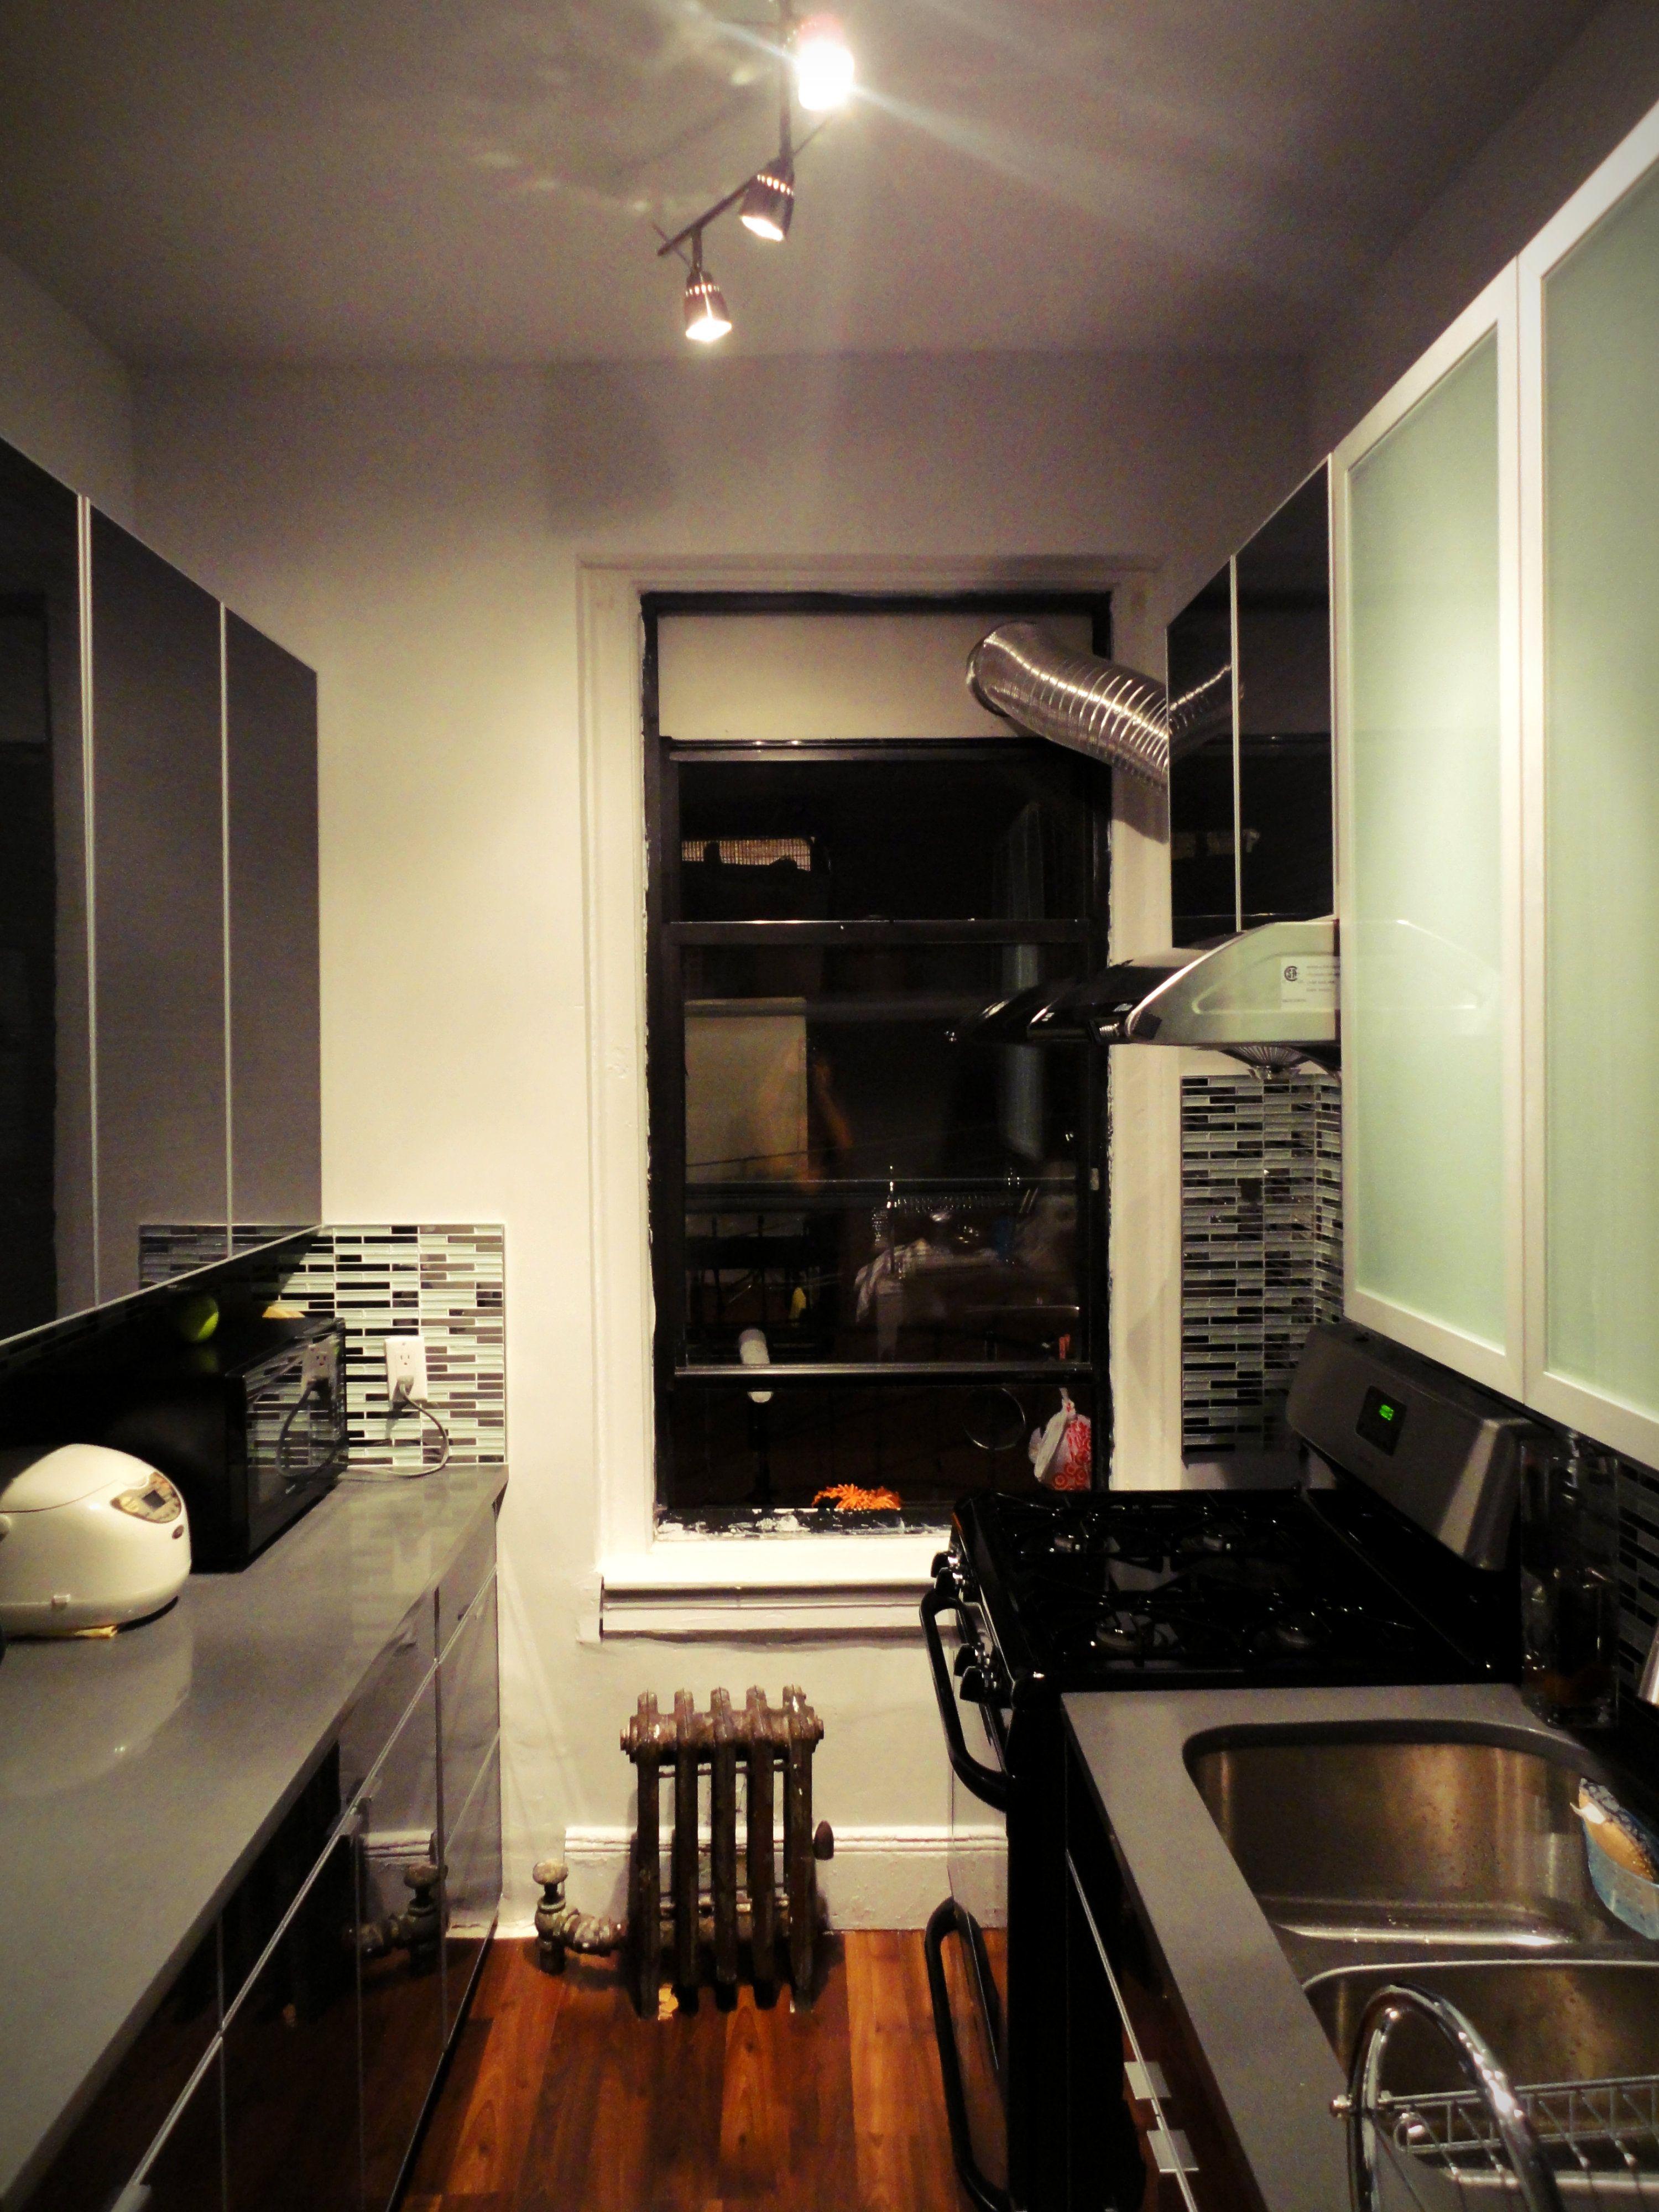 luxurious kitchen in a small nyc apartment luxury kitchens interior architecture design on kitchen interior luxury id=59976